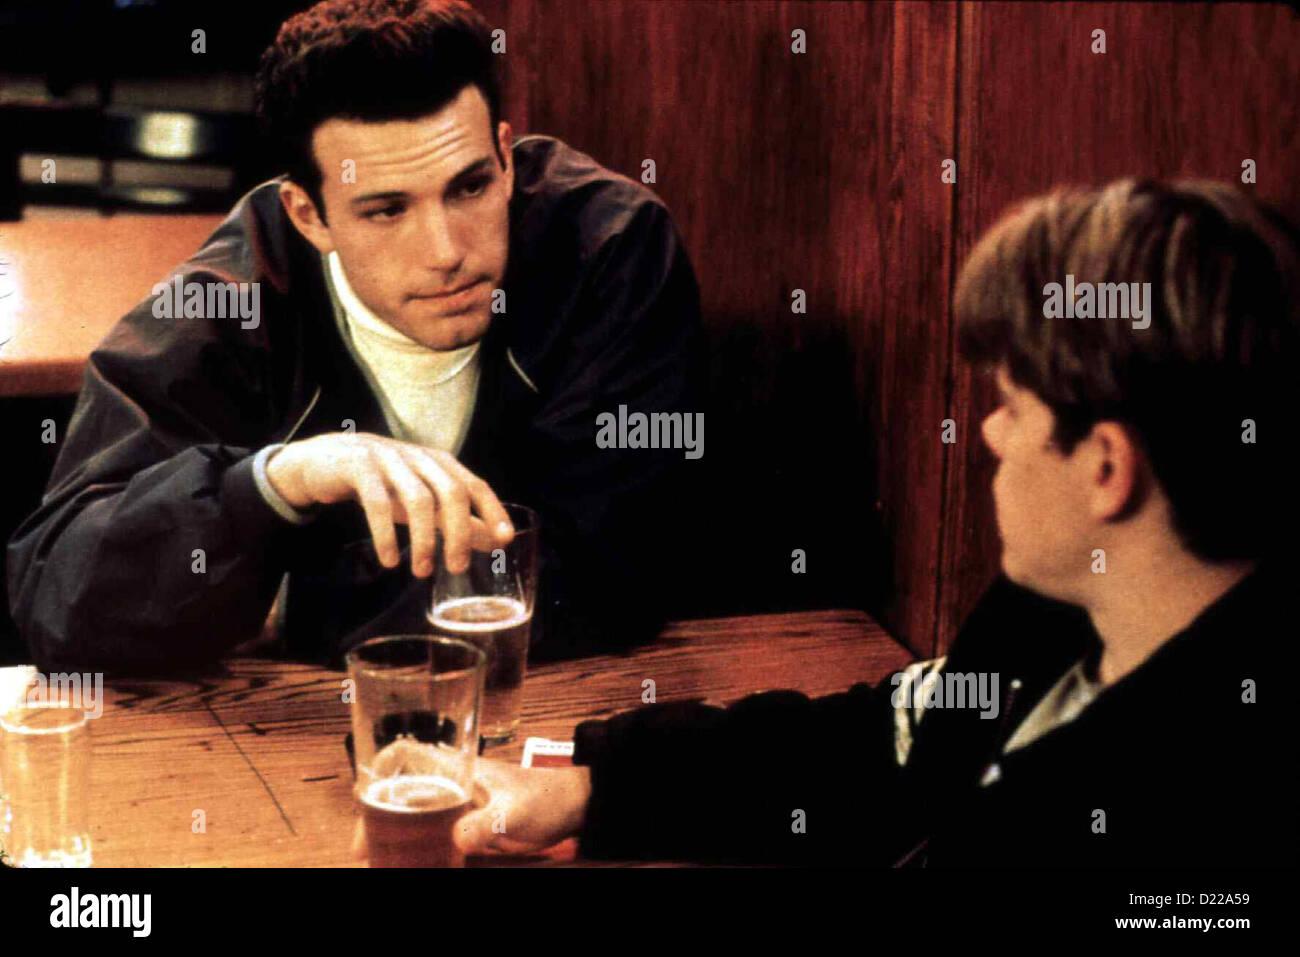 Good Will Hunting Good Will Hunting Ben Affleck, Matt Damon , Ben Affleck Chuckie (l ) tsi permettra (Matt Damon) Photo Stock